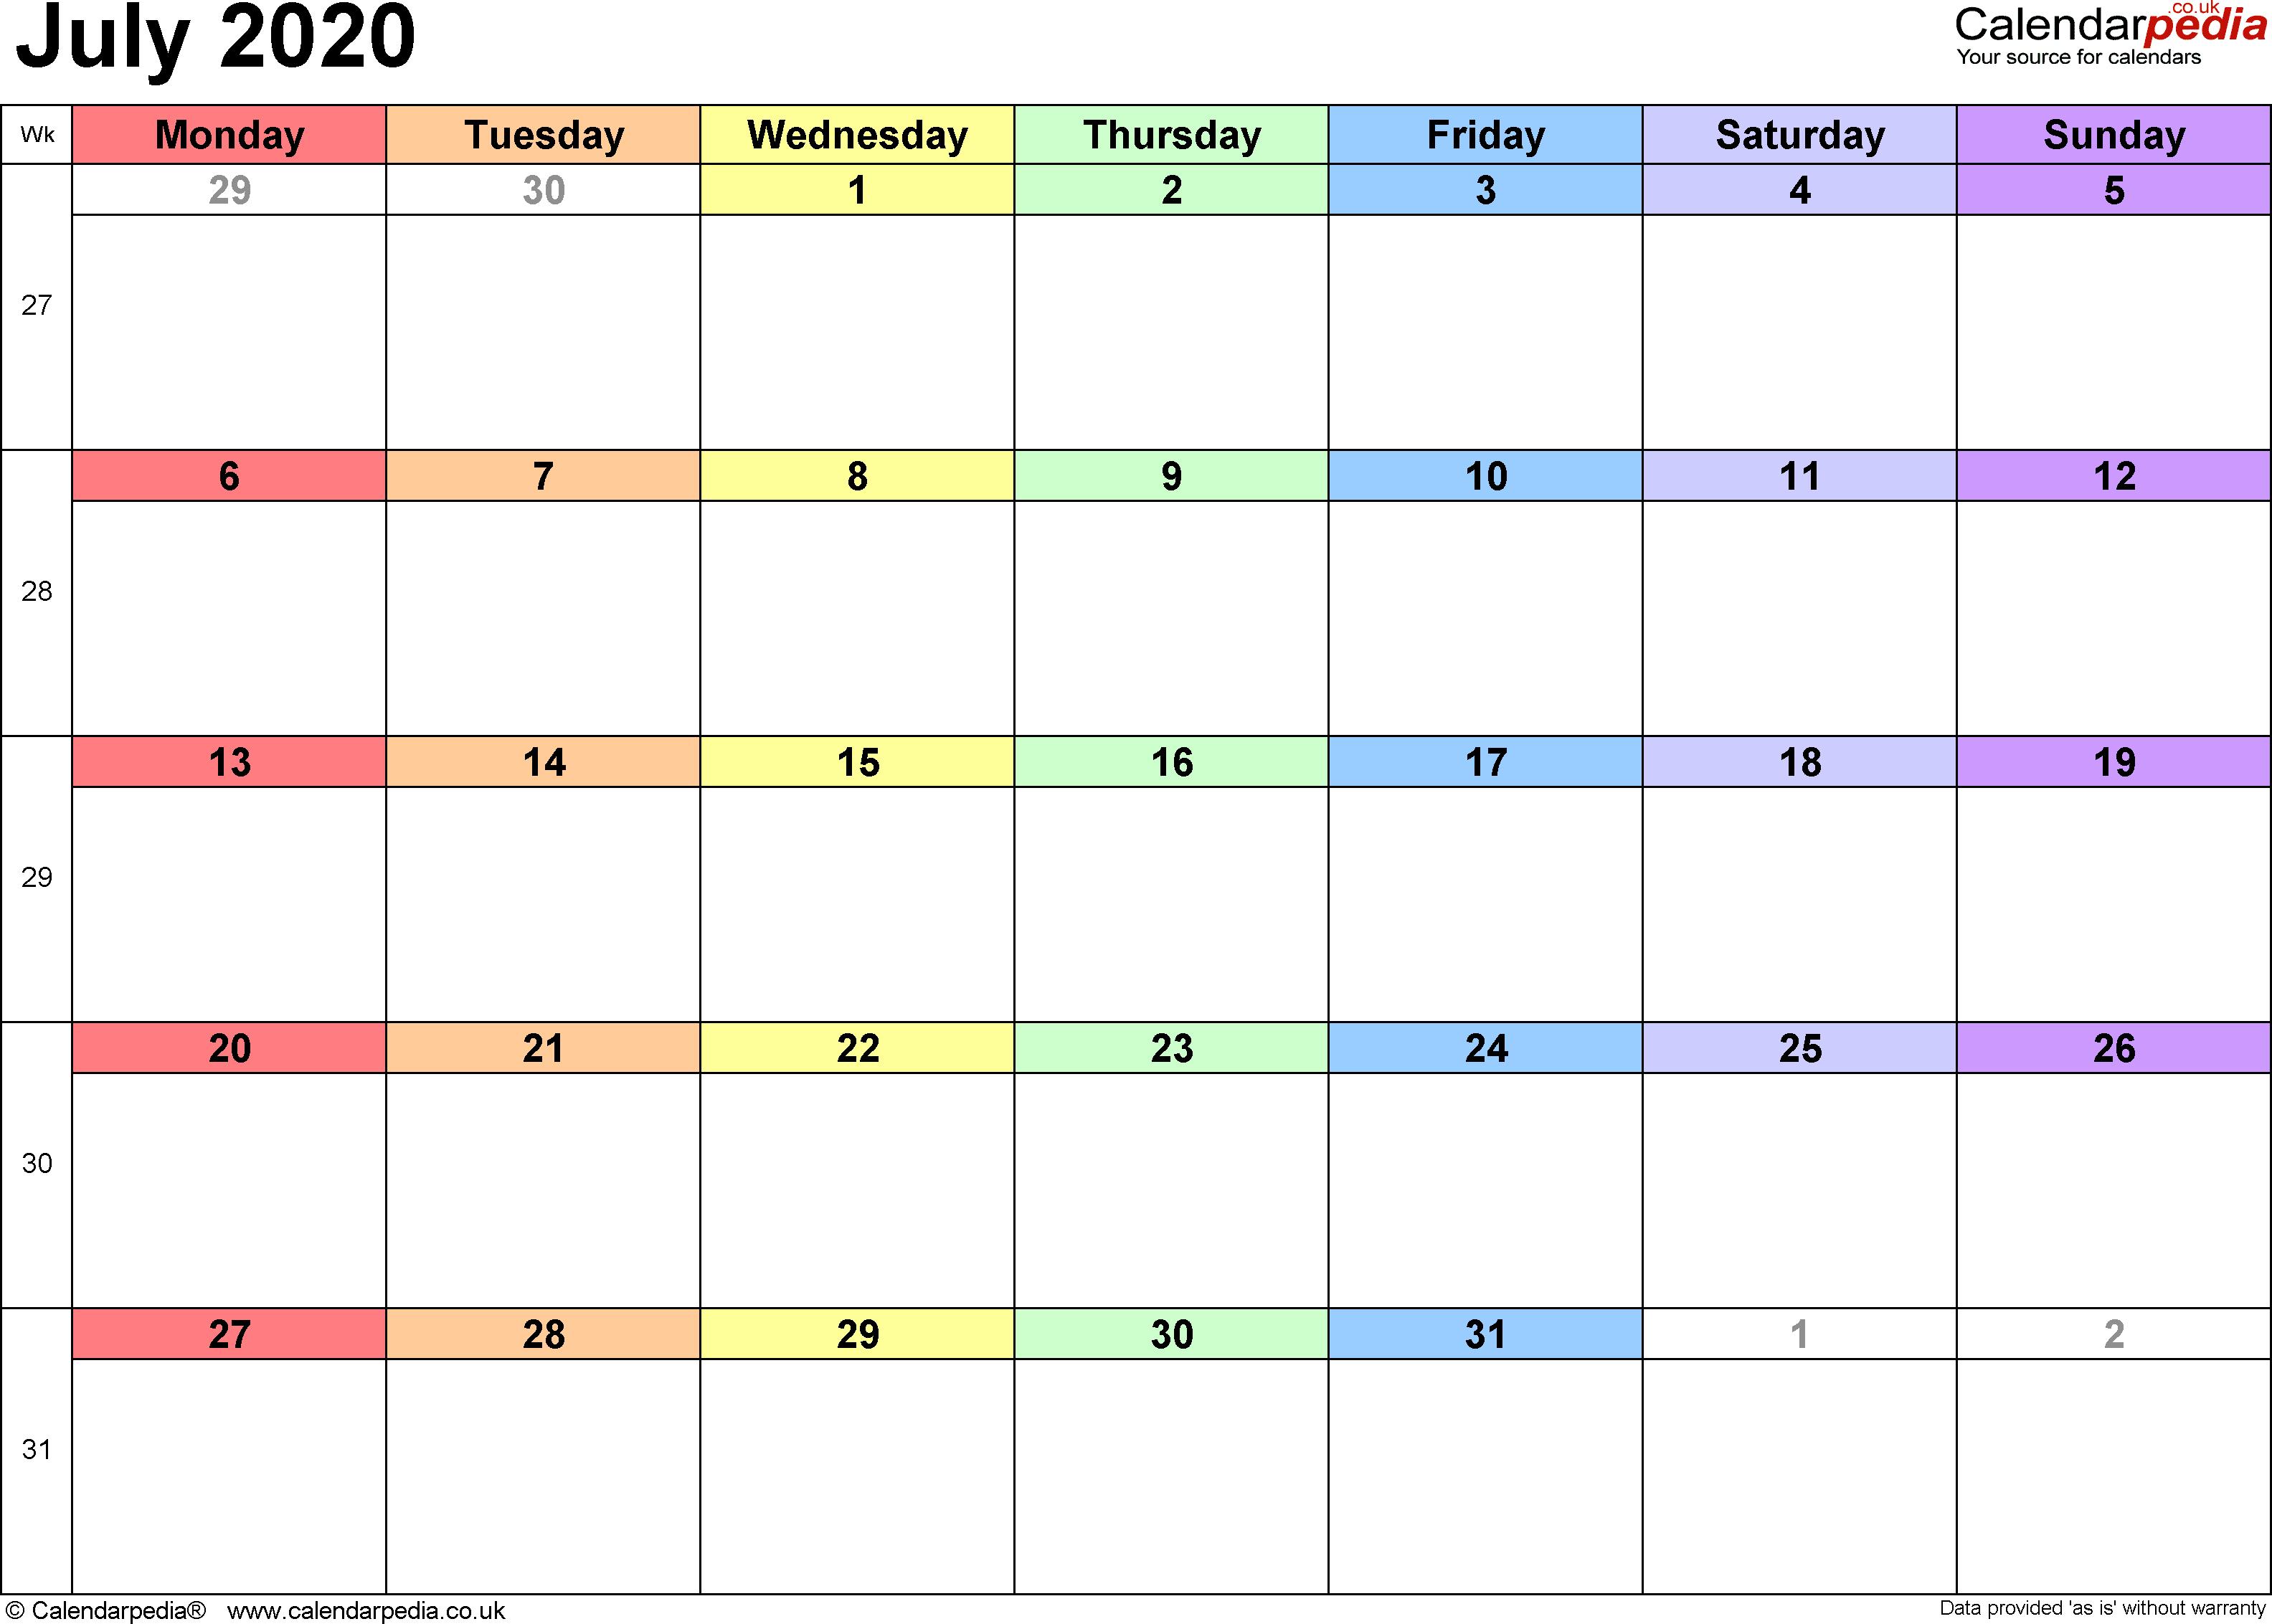 Calendar July 2020 UK, Bank Holidays, Excel/PDF/Word Templates